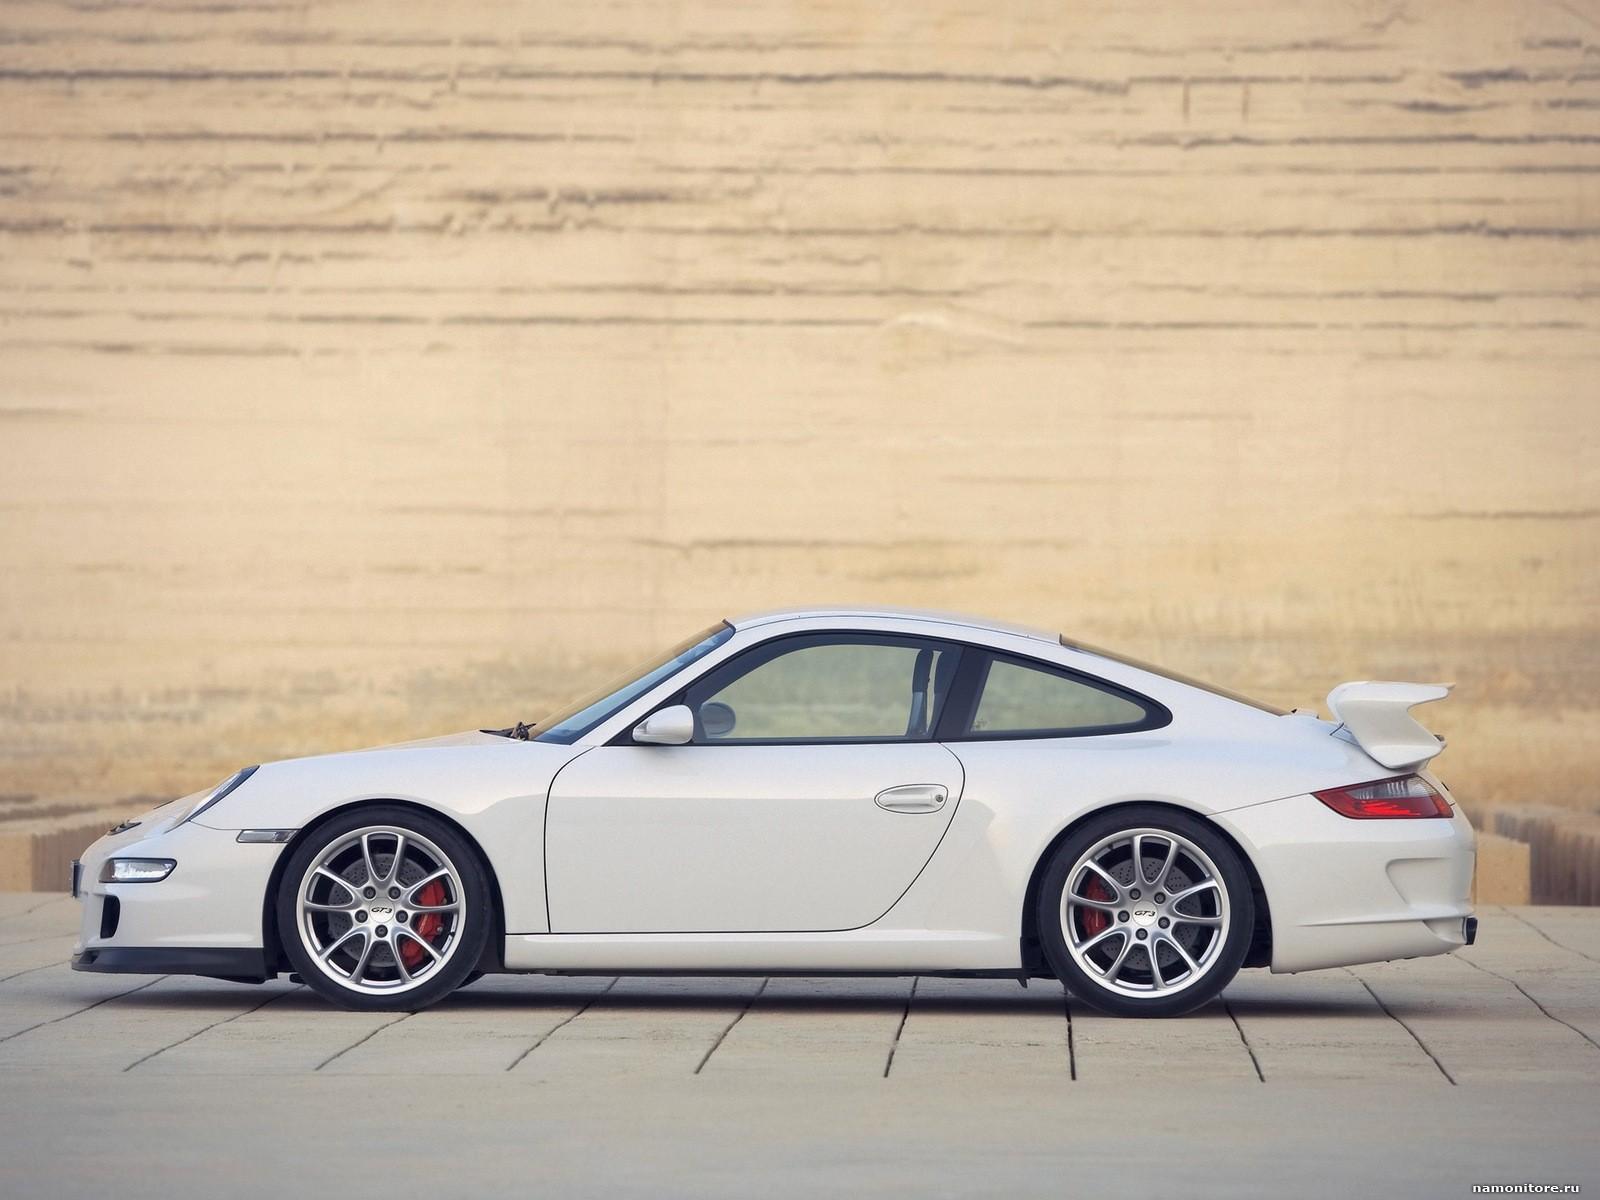 White Porsche 997 GT3 Photo